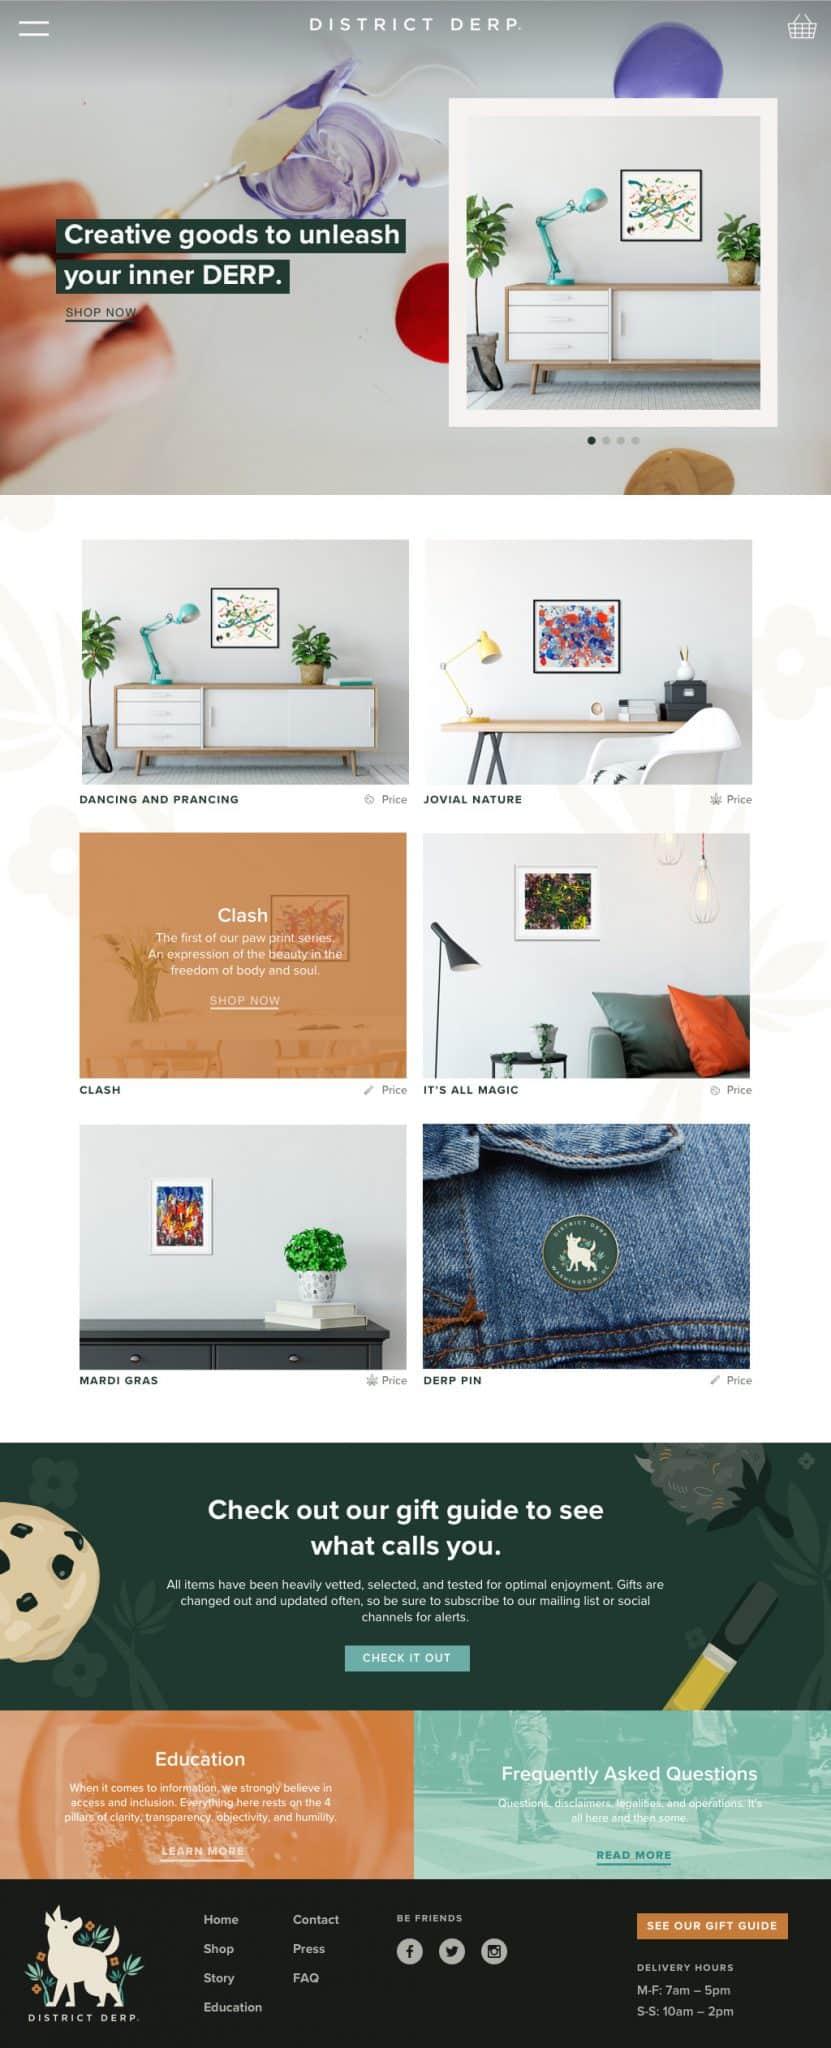 eCommerce website shop page for District Derp